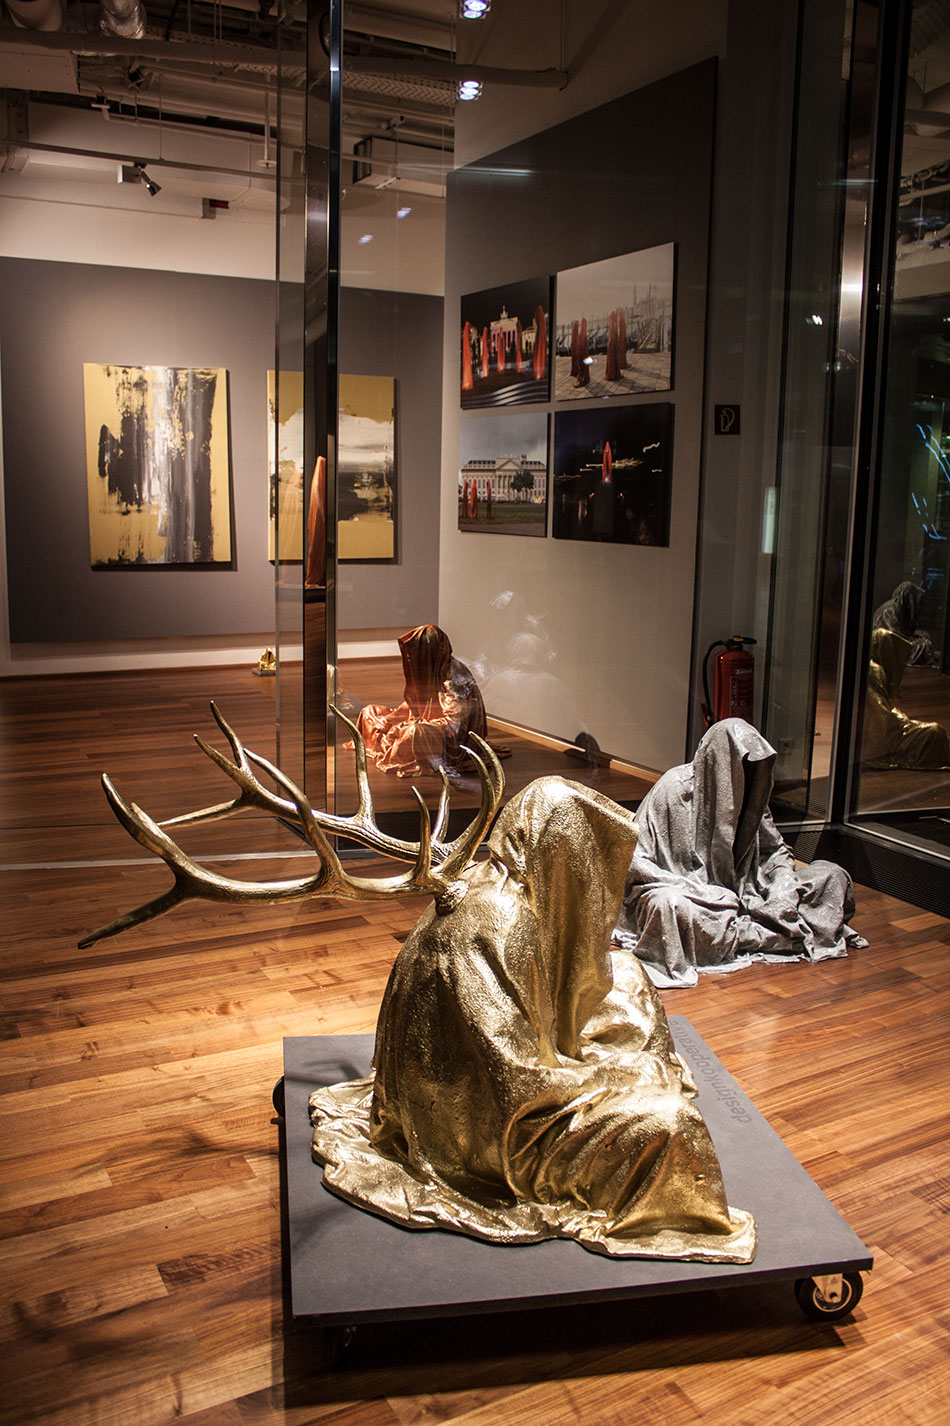 stilwerk-wien-designtower-vienna-show-guardians-of-time-waechter-der-zeit-manfred-kielnhofer-modern-contemporary-fine-art-design-sculpture-3d-arts-3938